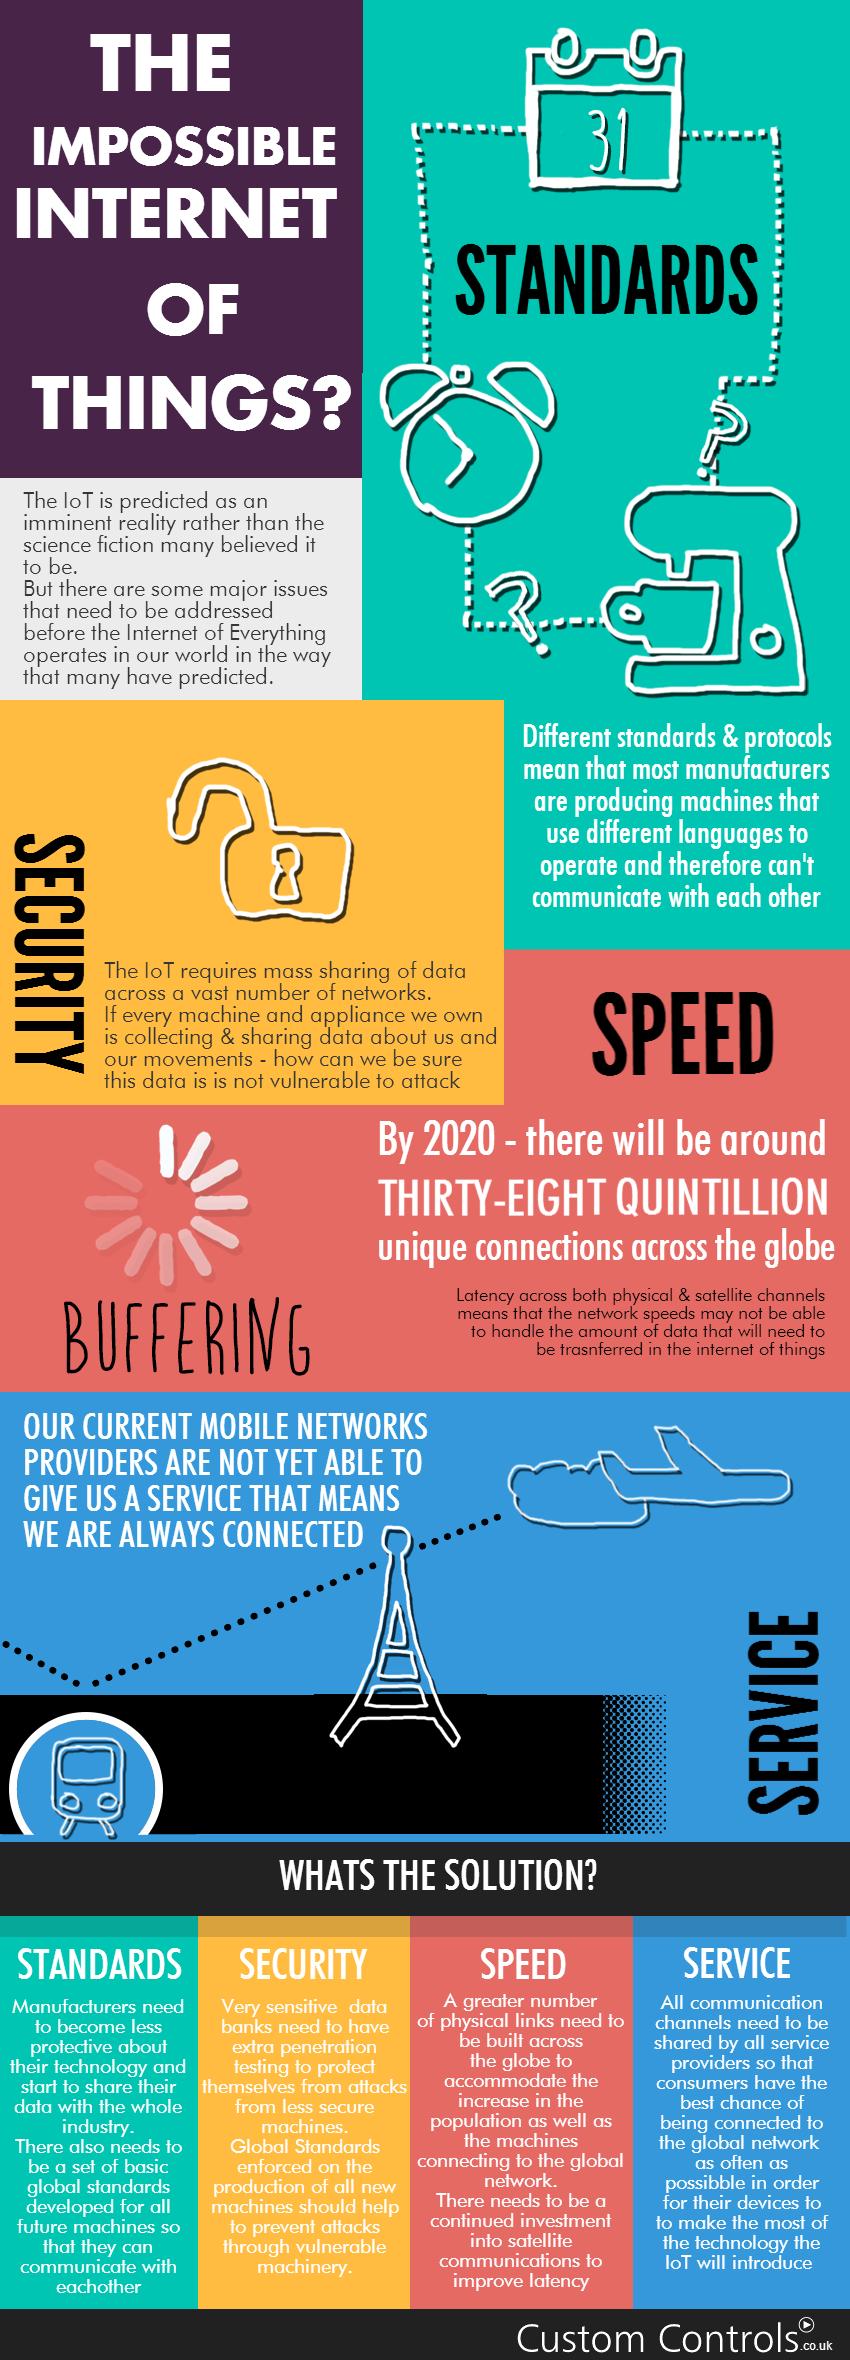 custom-controls-Internet-of-Things1